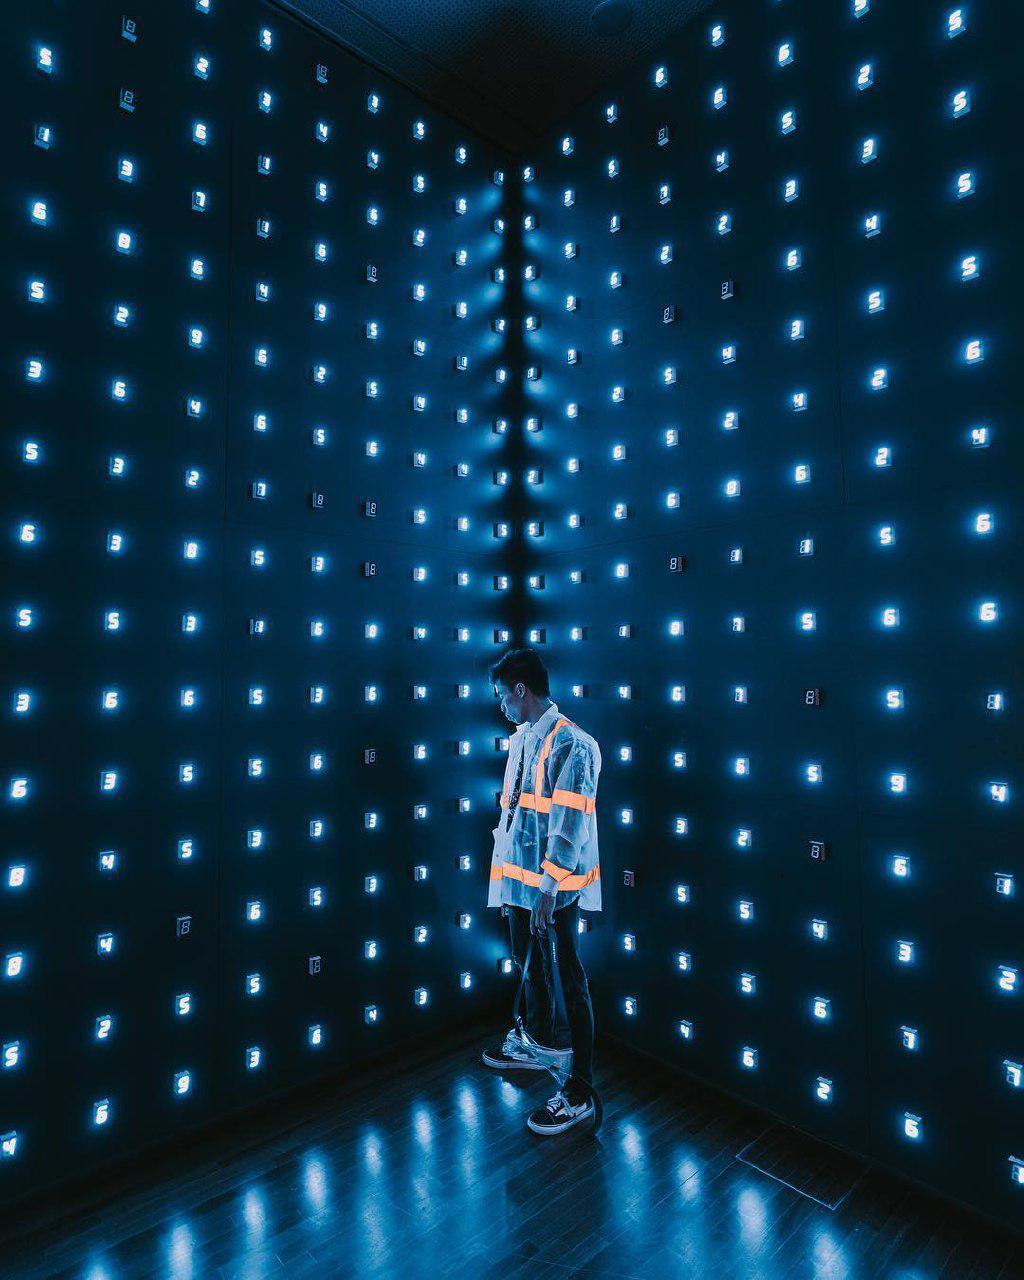 Minimalism: Light. Space. Object